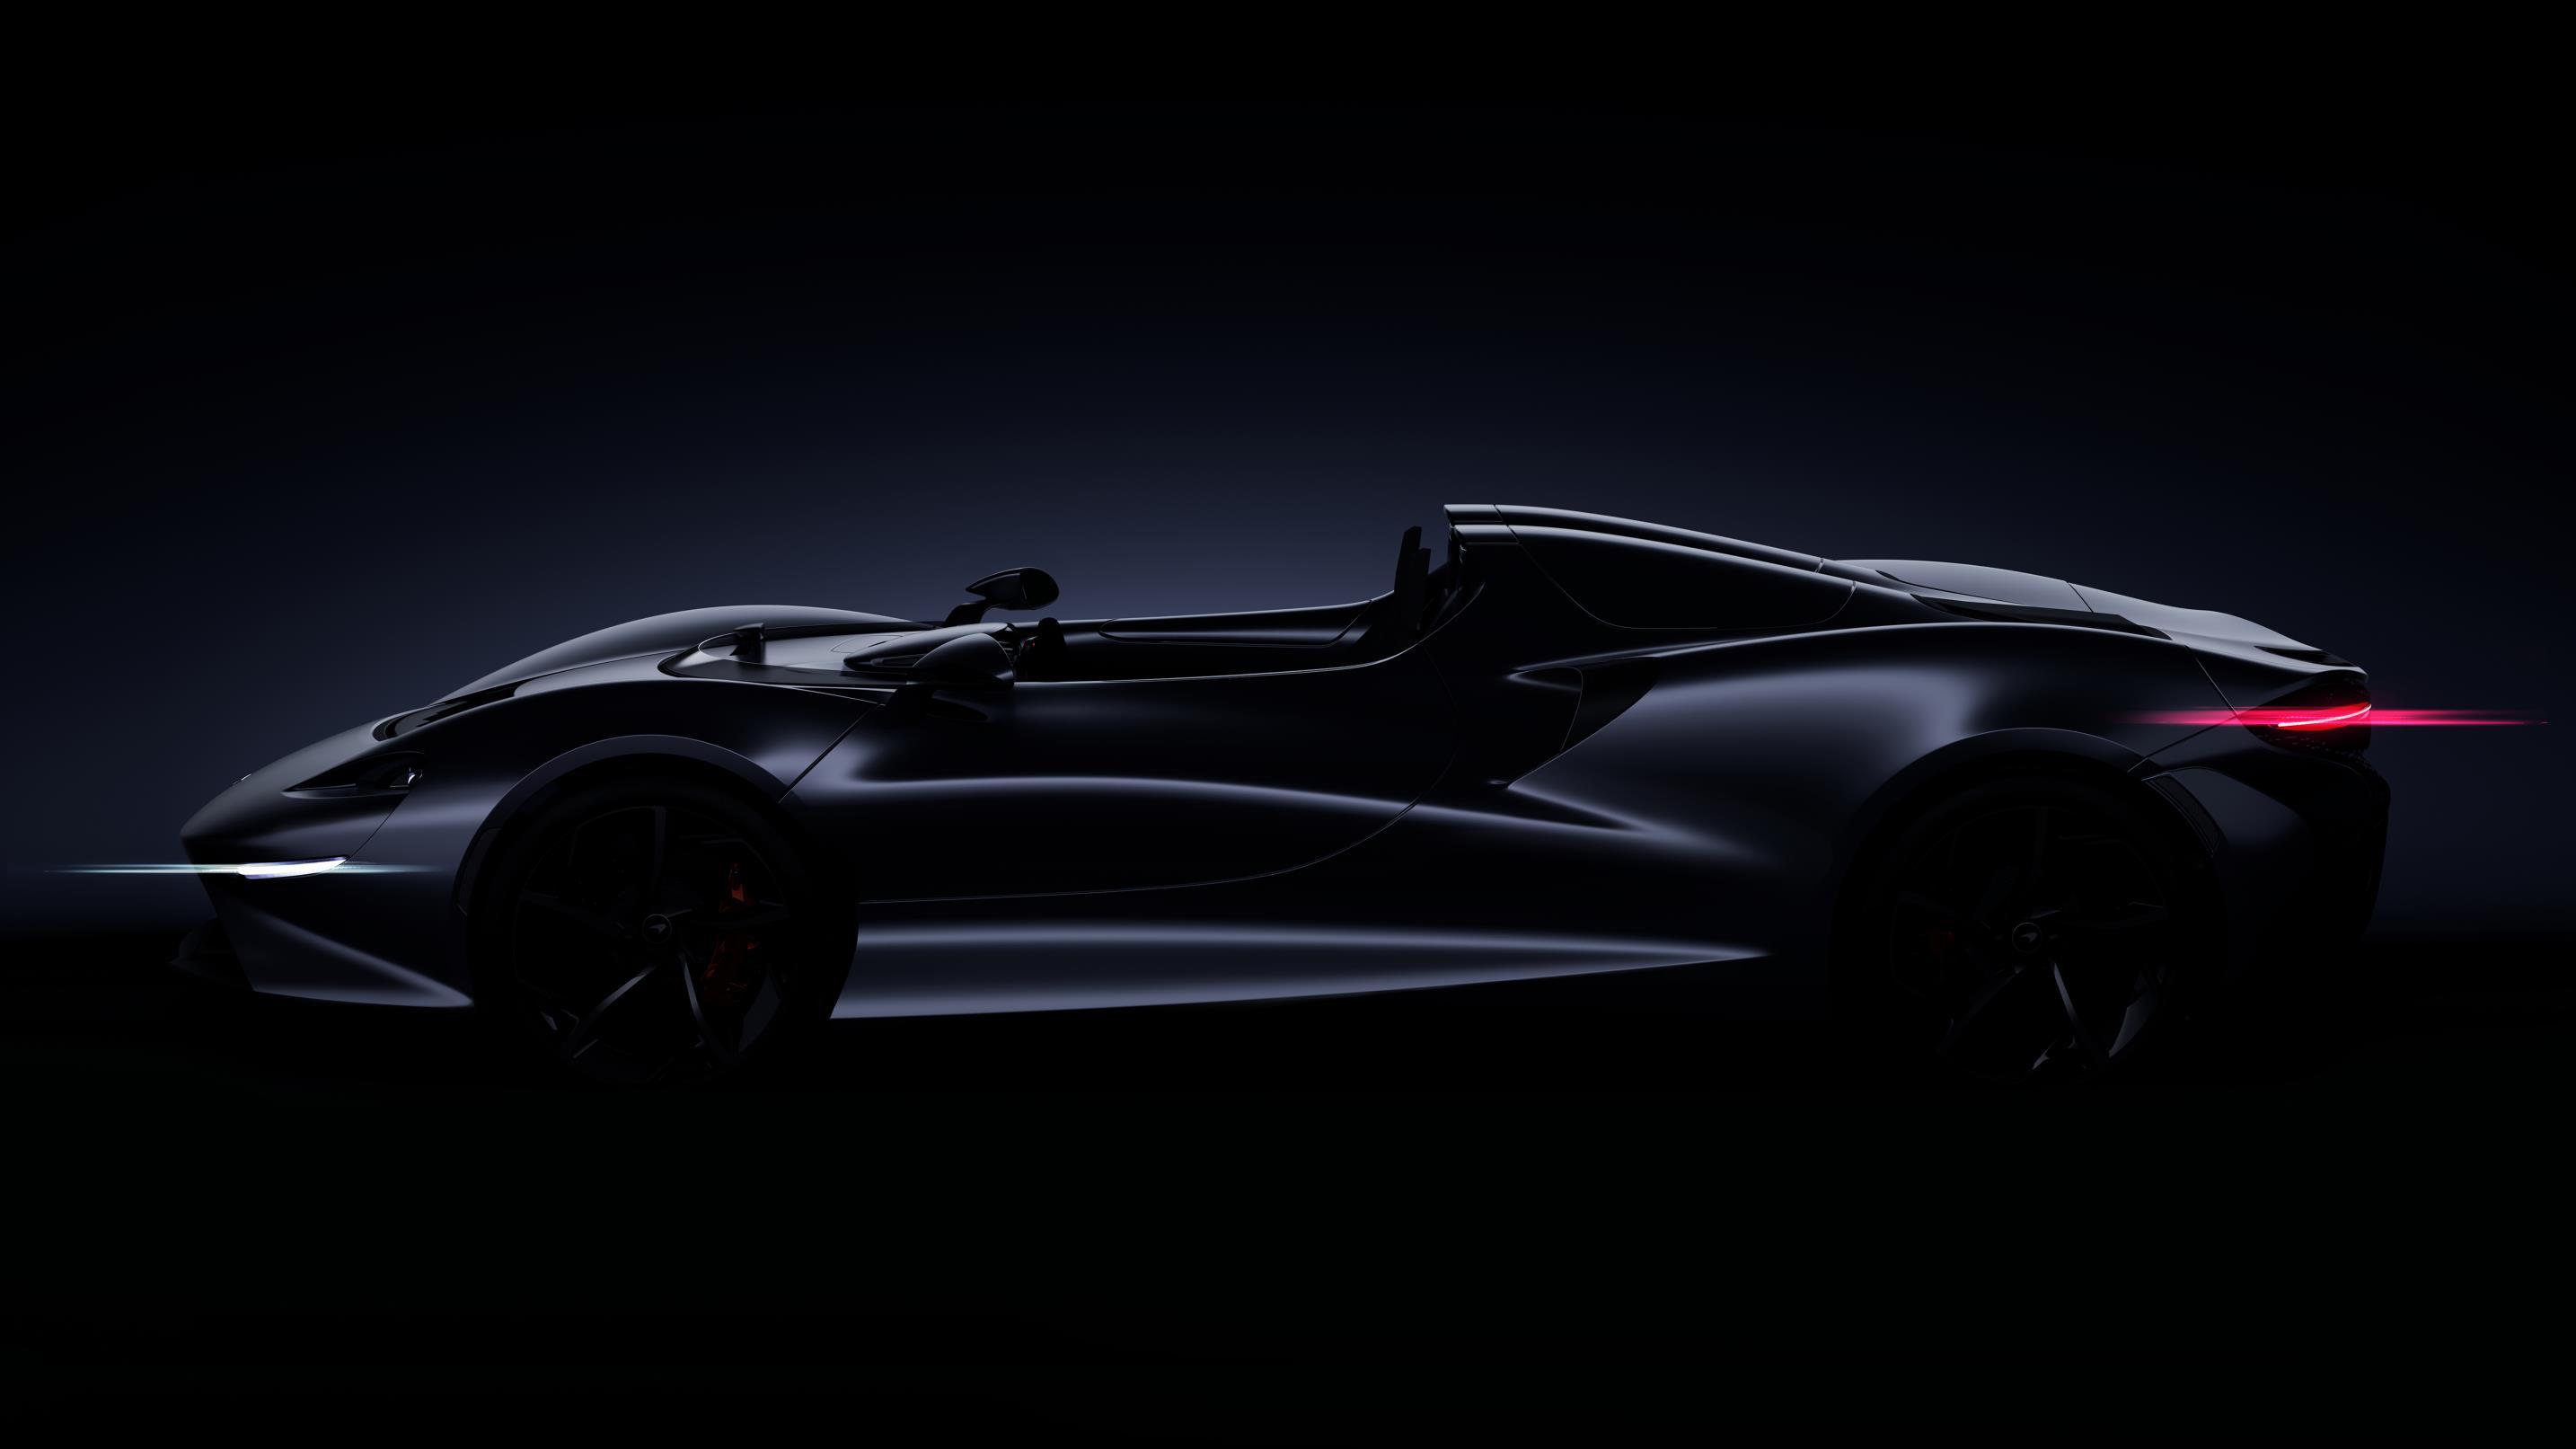 McLaren Automotive announces striking new Ultimate Series model